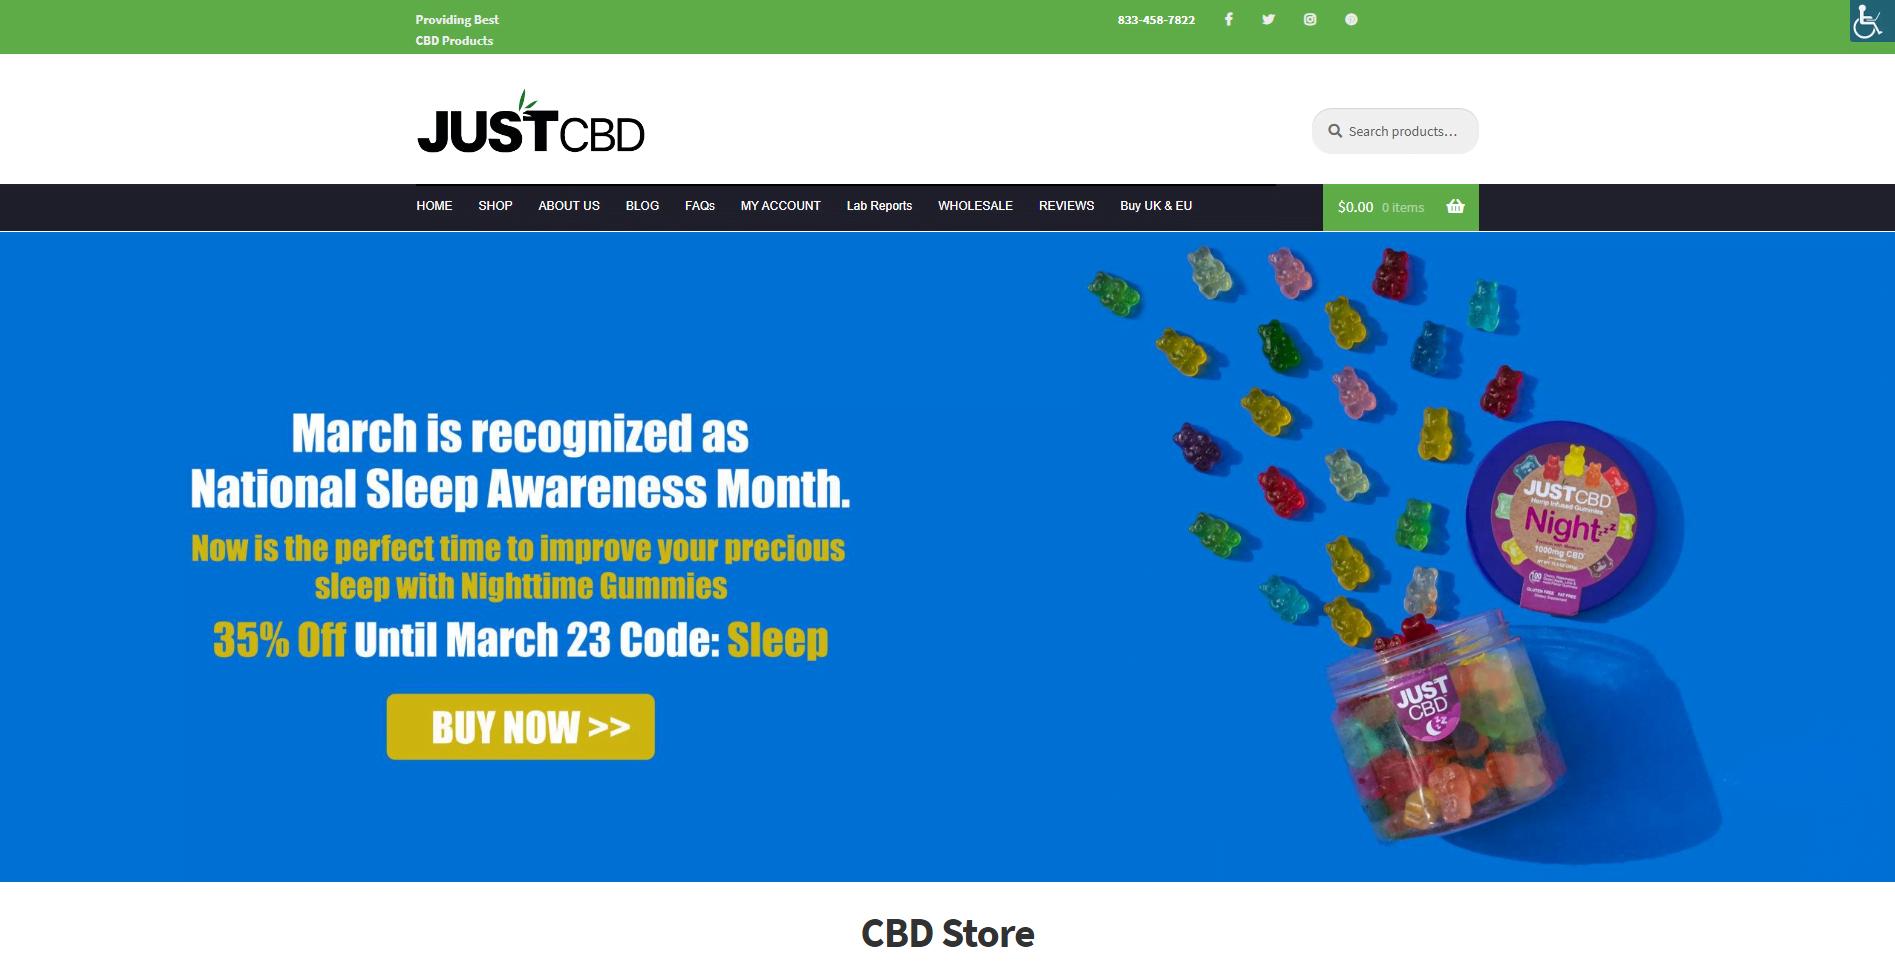 JustCBD Strore